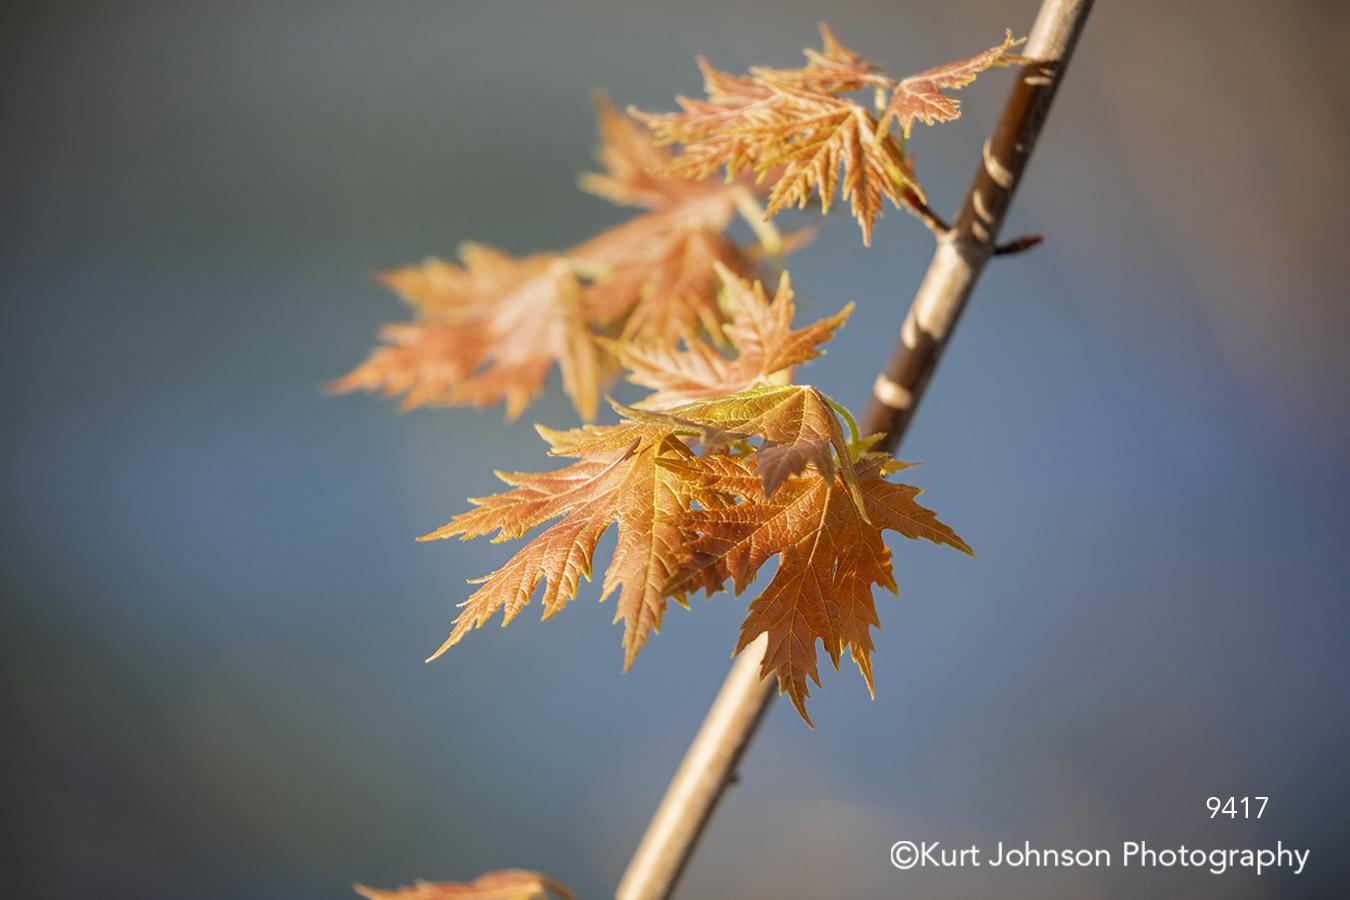 orange maple leaves branch tree close up detail autumn fall macro